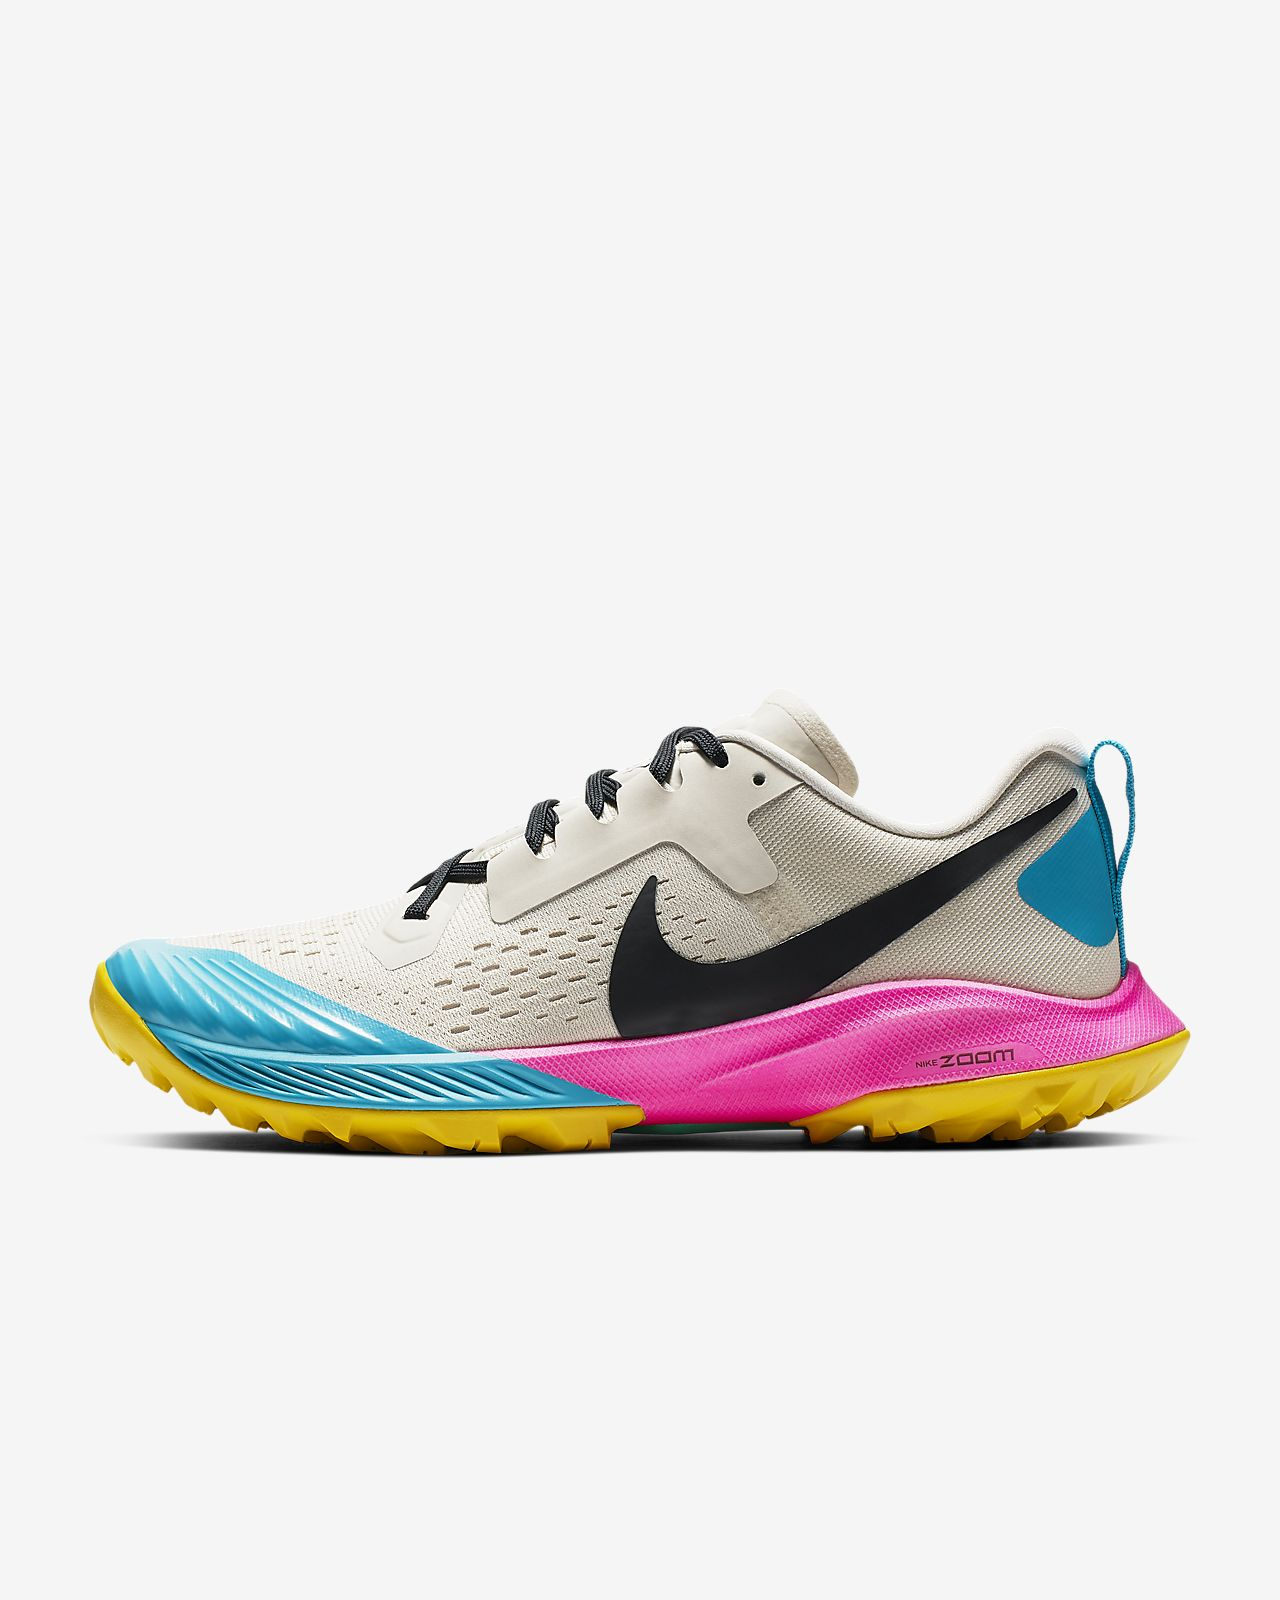 Calzado de running para mujer Nike Air Zoom Terra Kiger 5